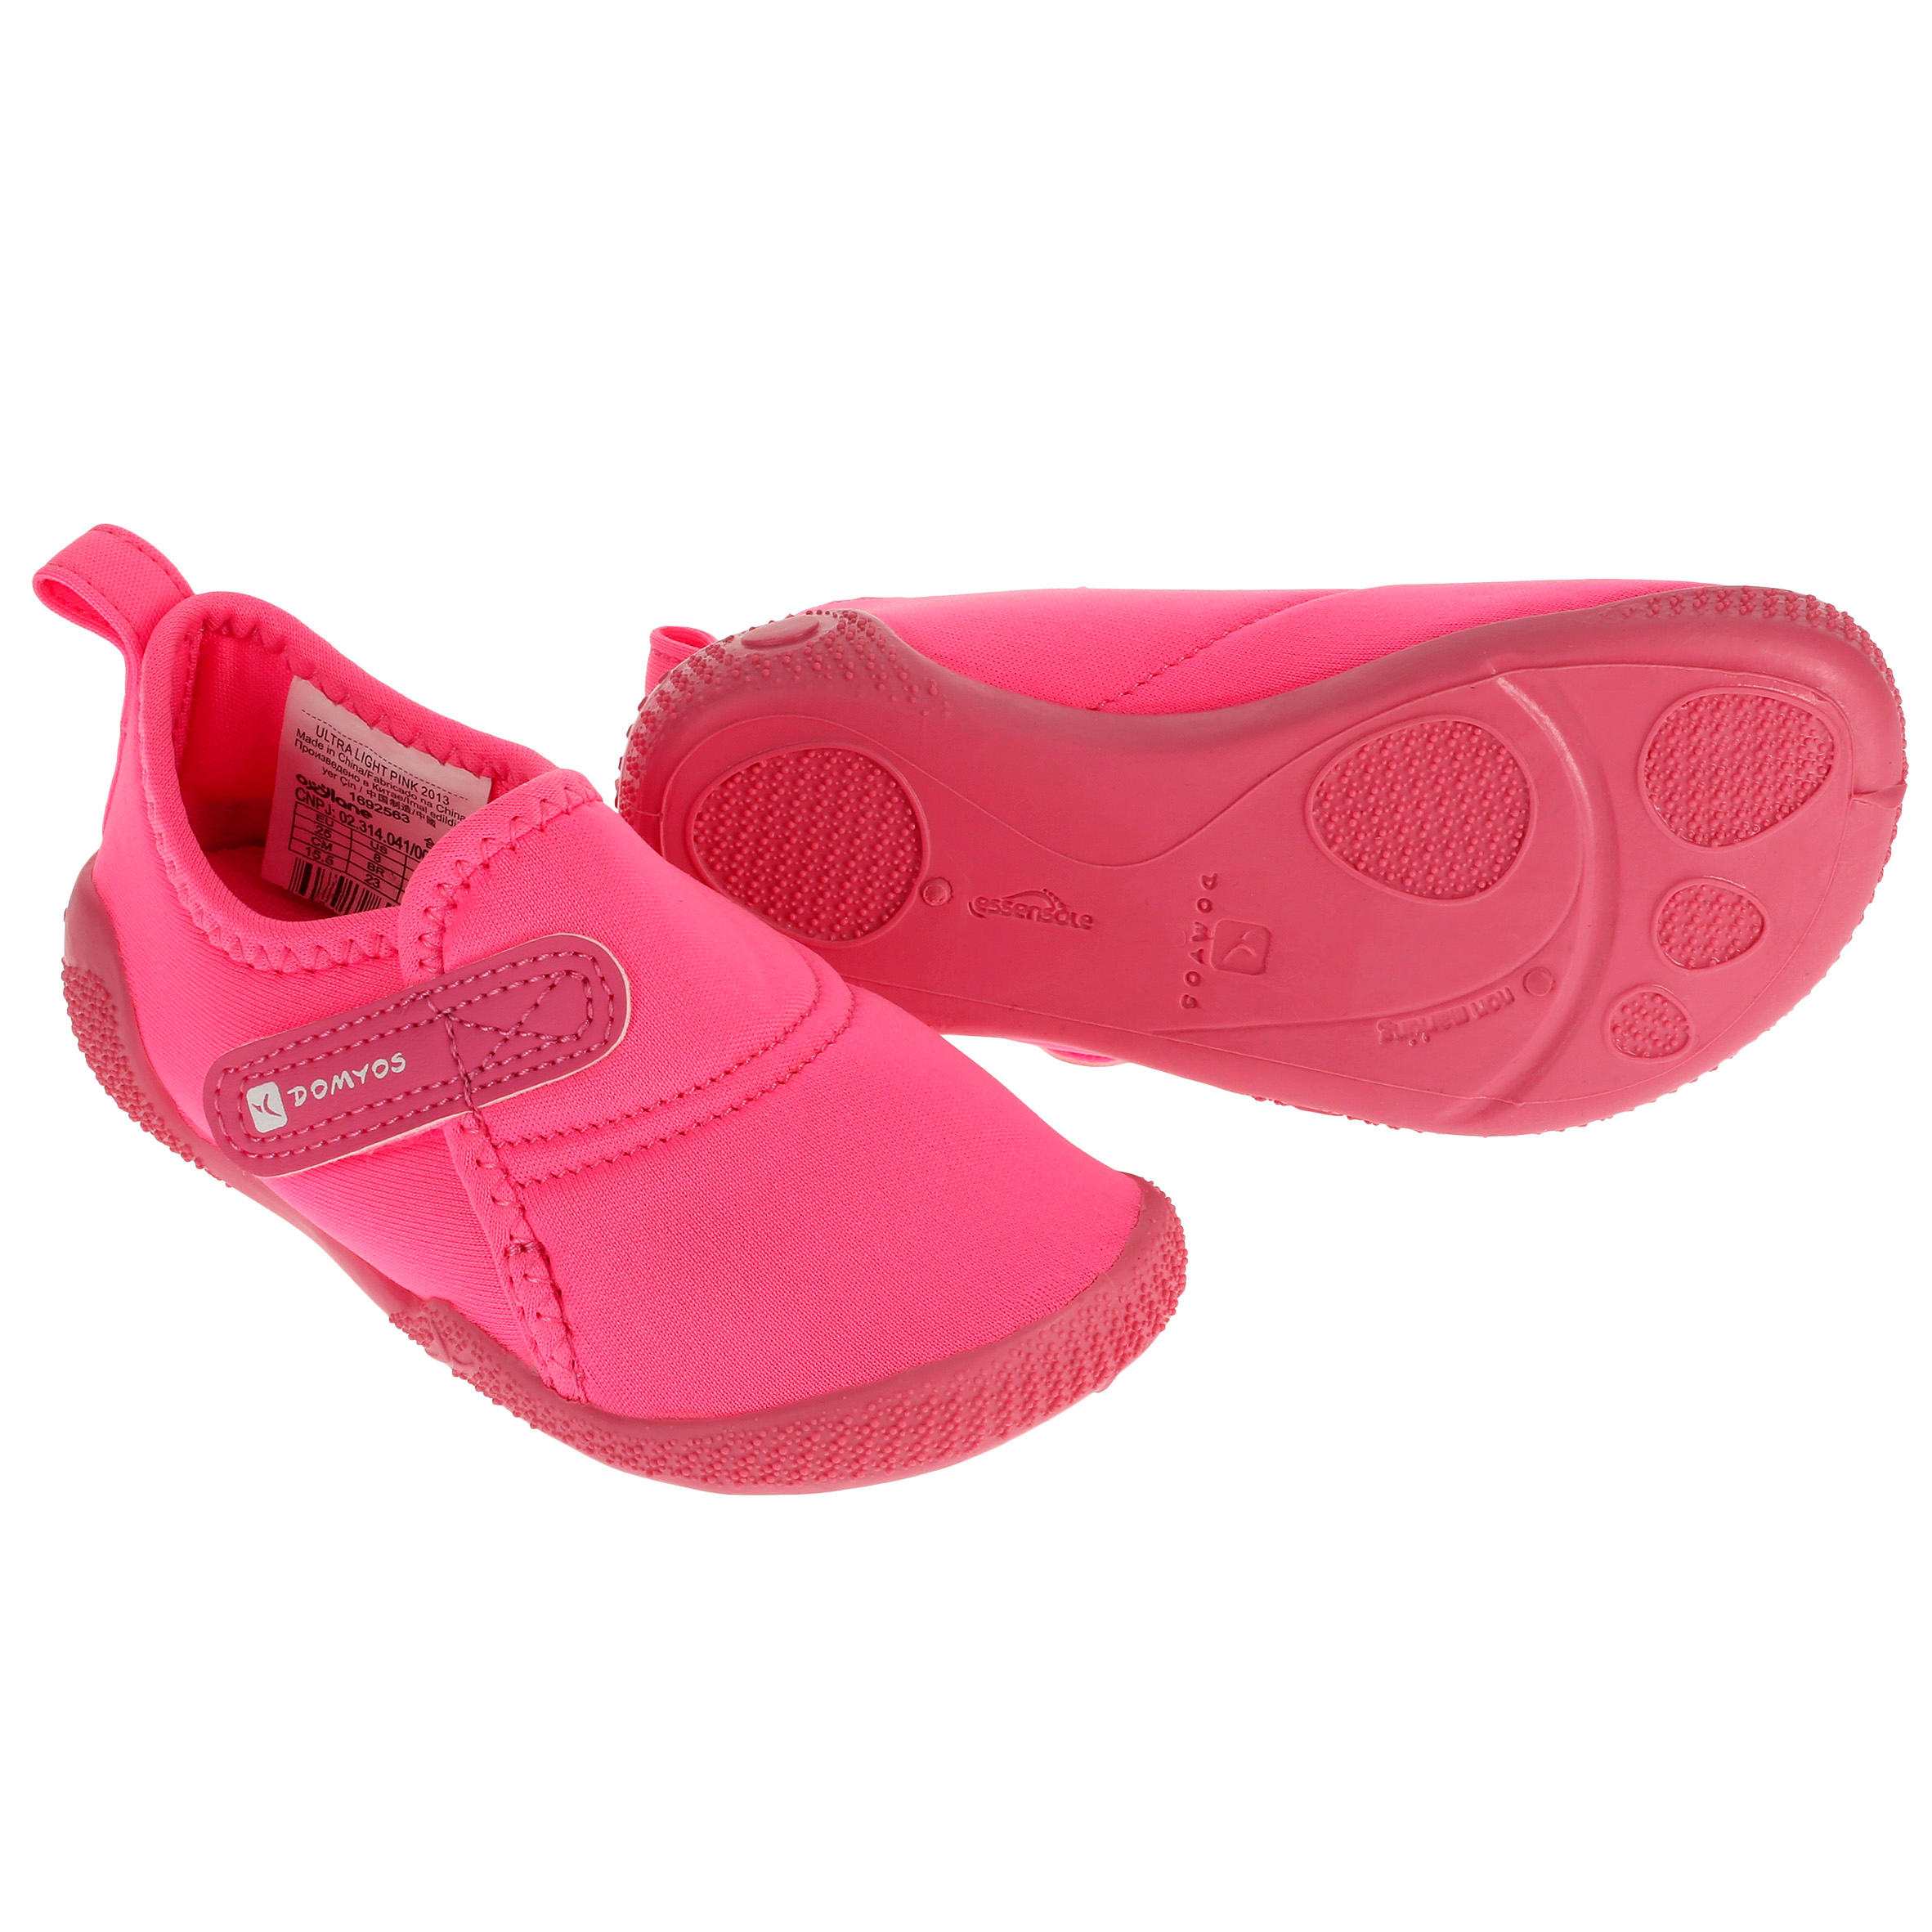 Babygymschoentjes Ultralight roze